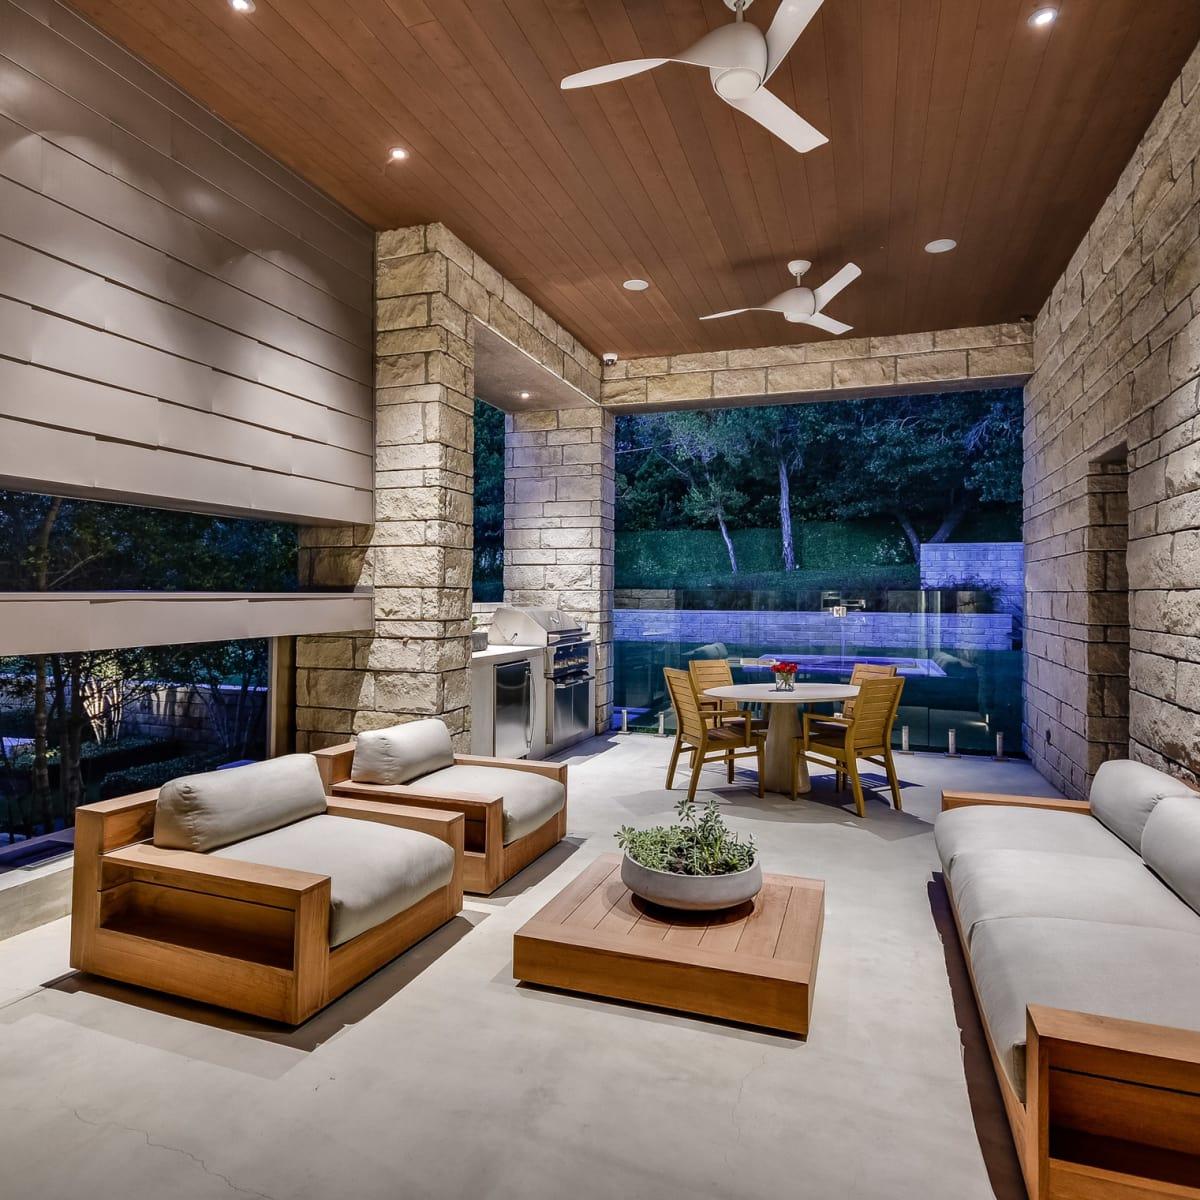 2009 Cueva de Oro Austin house for sale living room